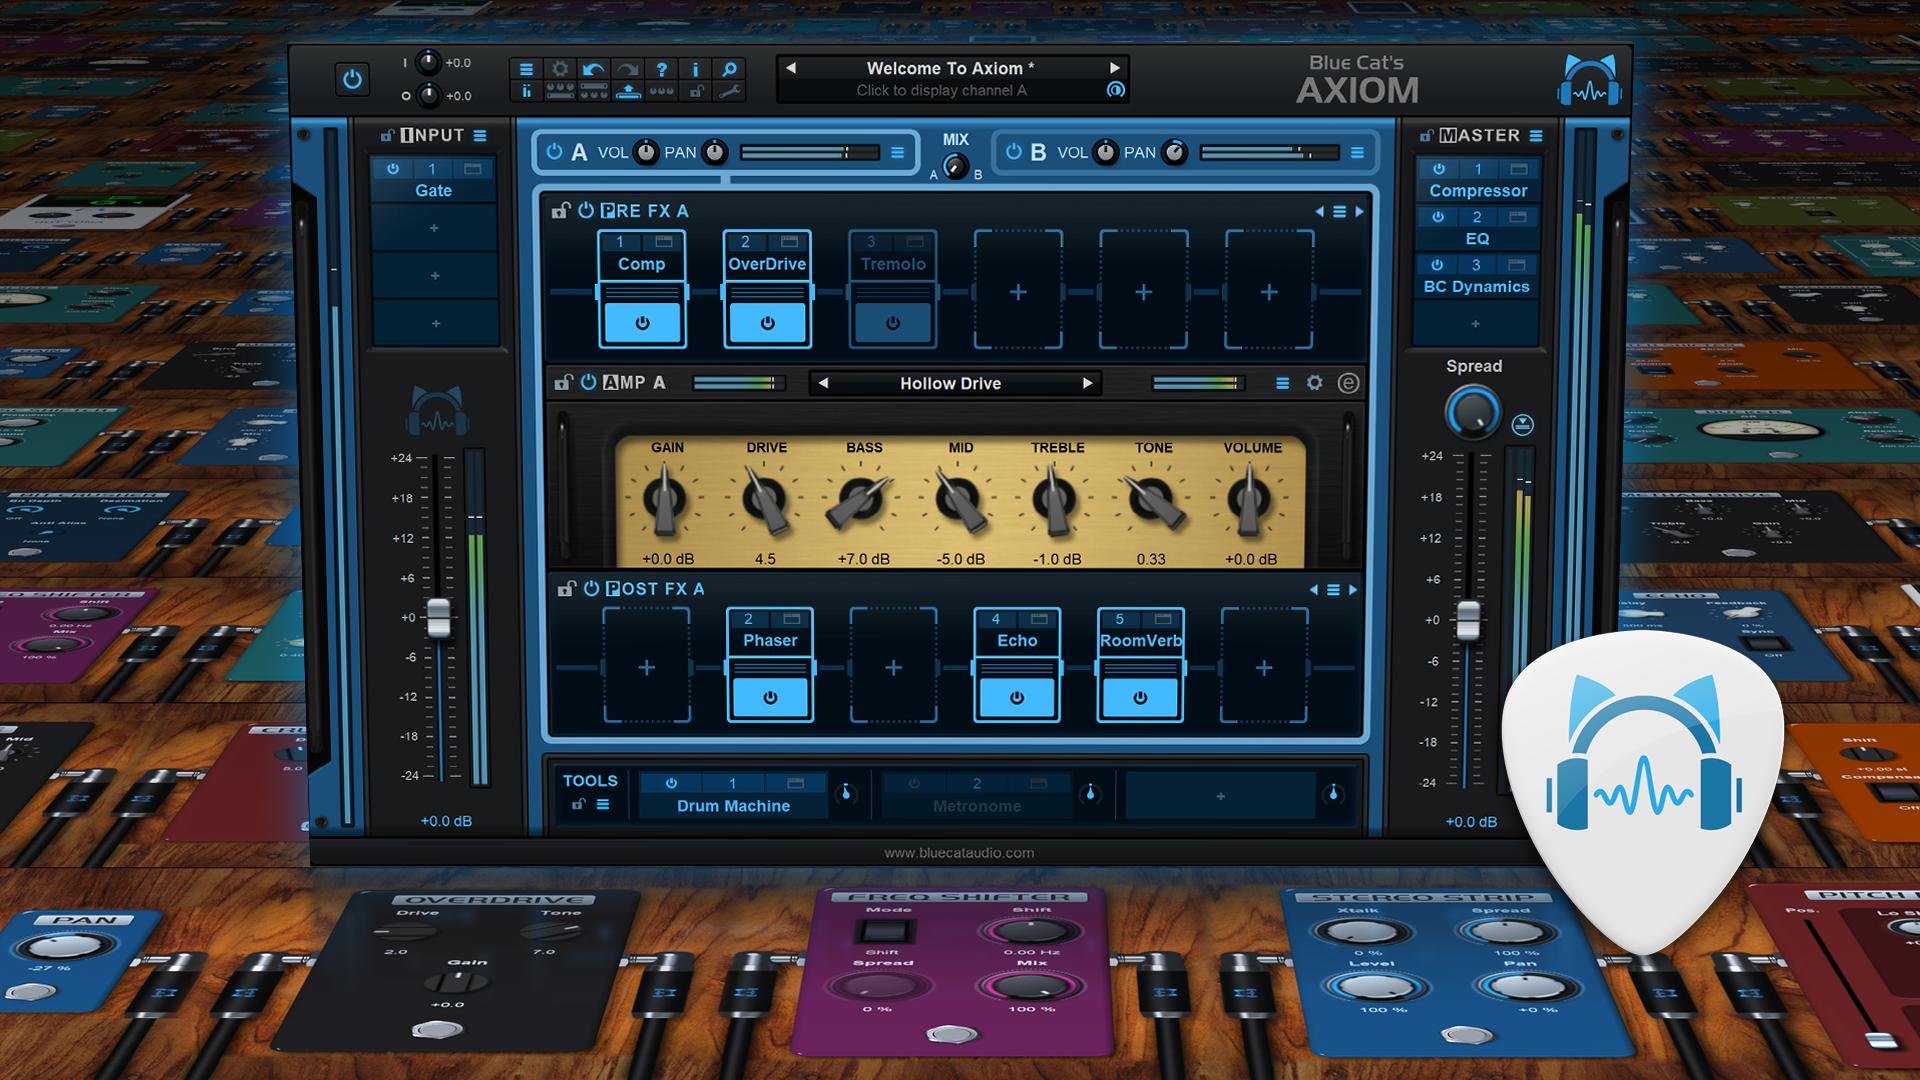 Detailed Axiom Walkthrough And Review